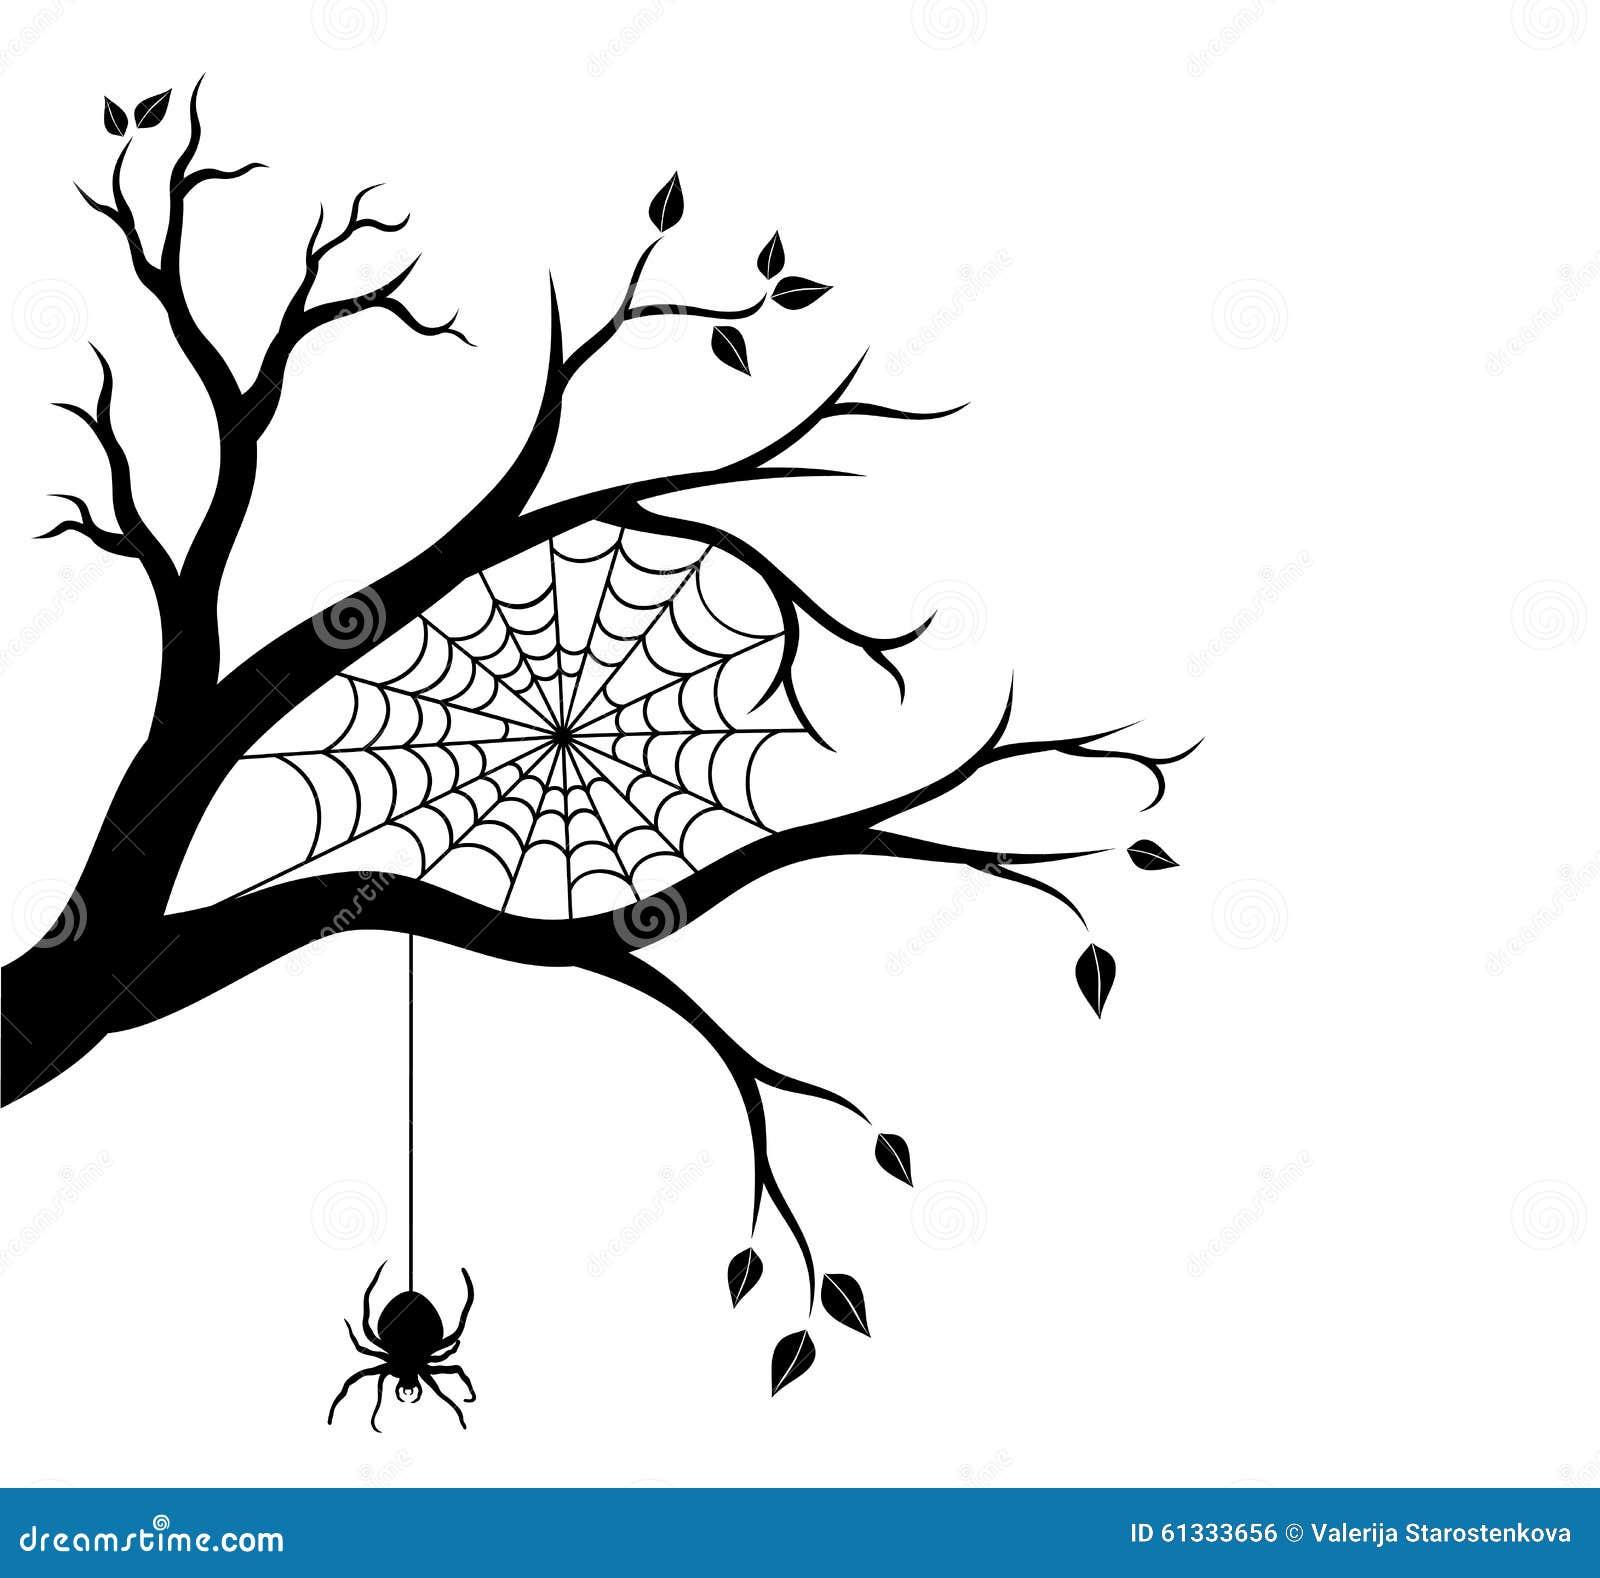 halloween tree branch and spider web stock vector image halloween pumpkin clipart outline halloween pumpkin clipart free